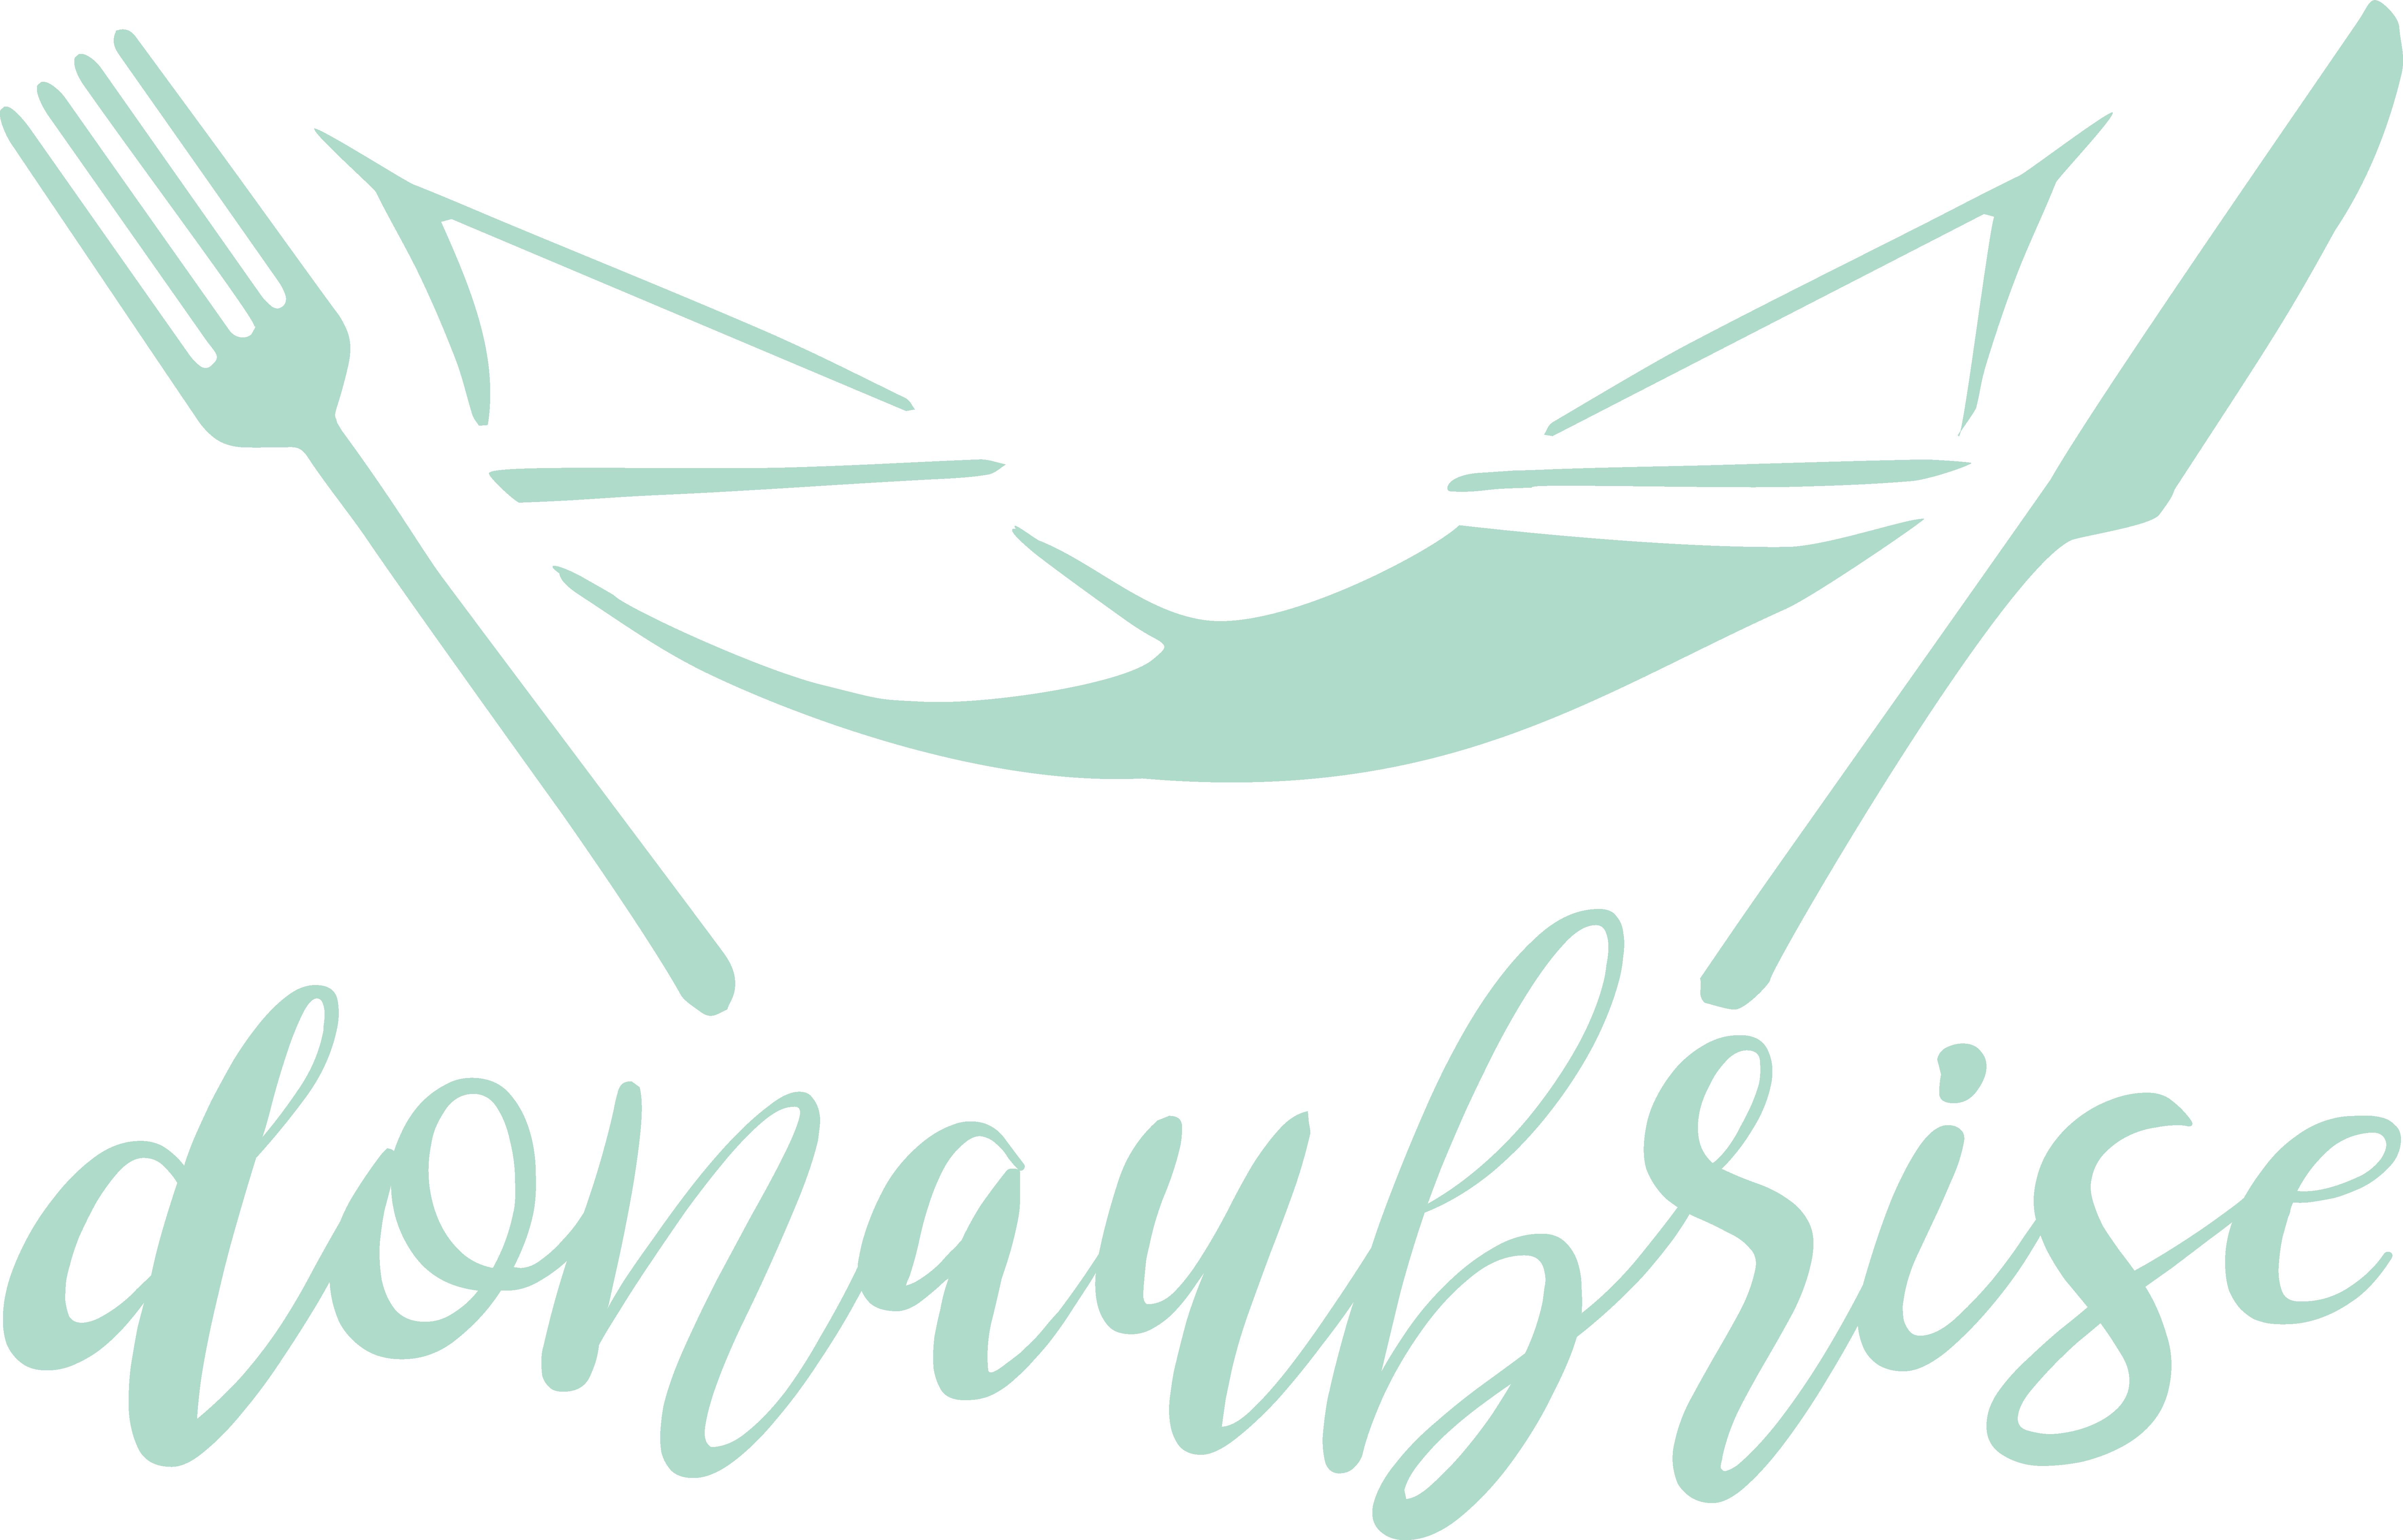 Donaubrise_logo_brushgya_kursiv_Strandbad Josefine_dunkleresgrün_600